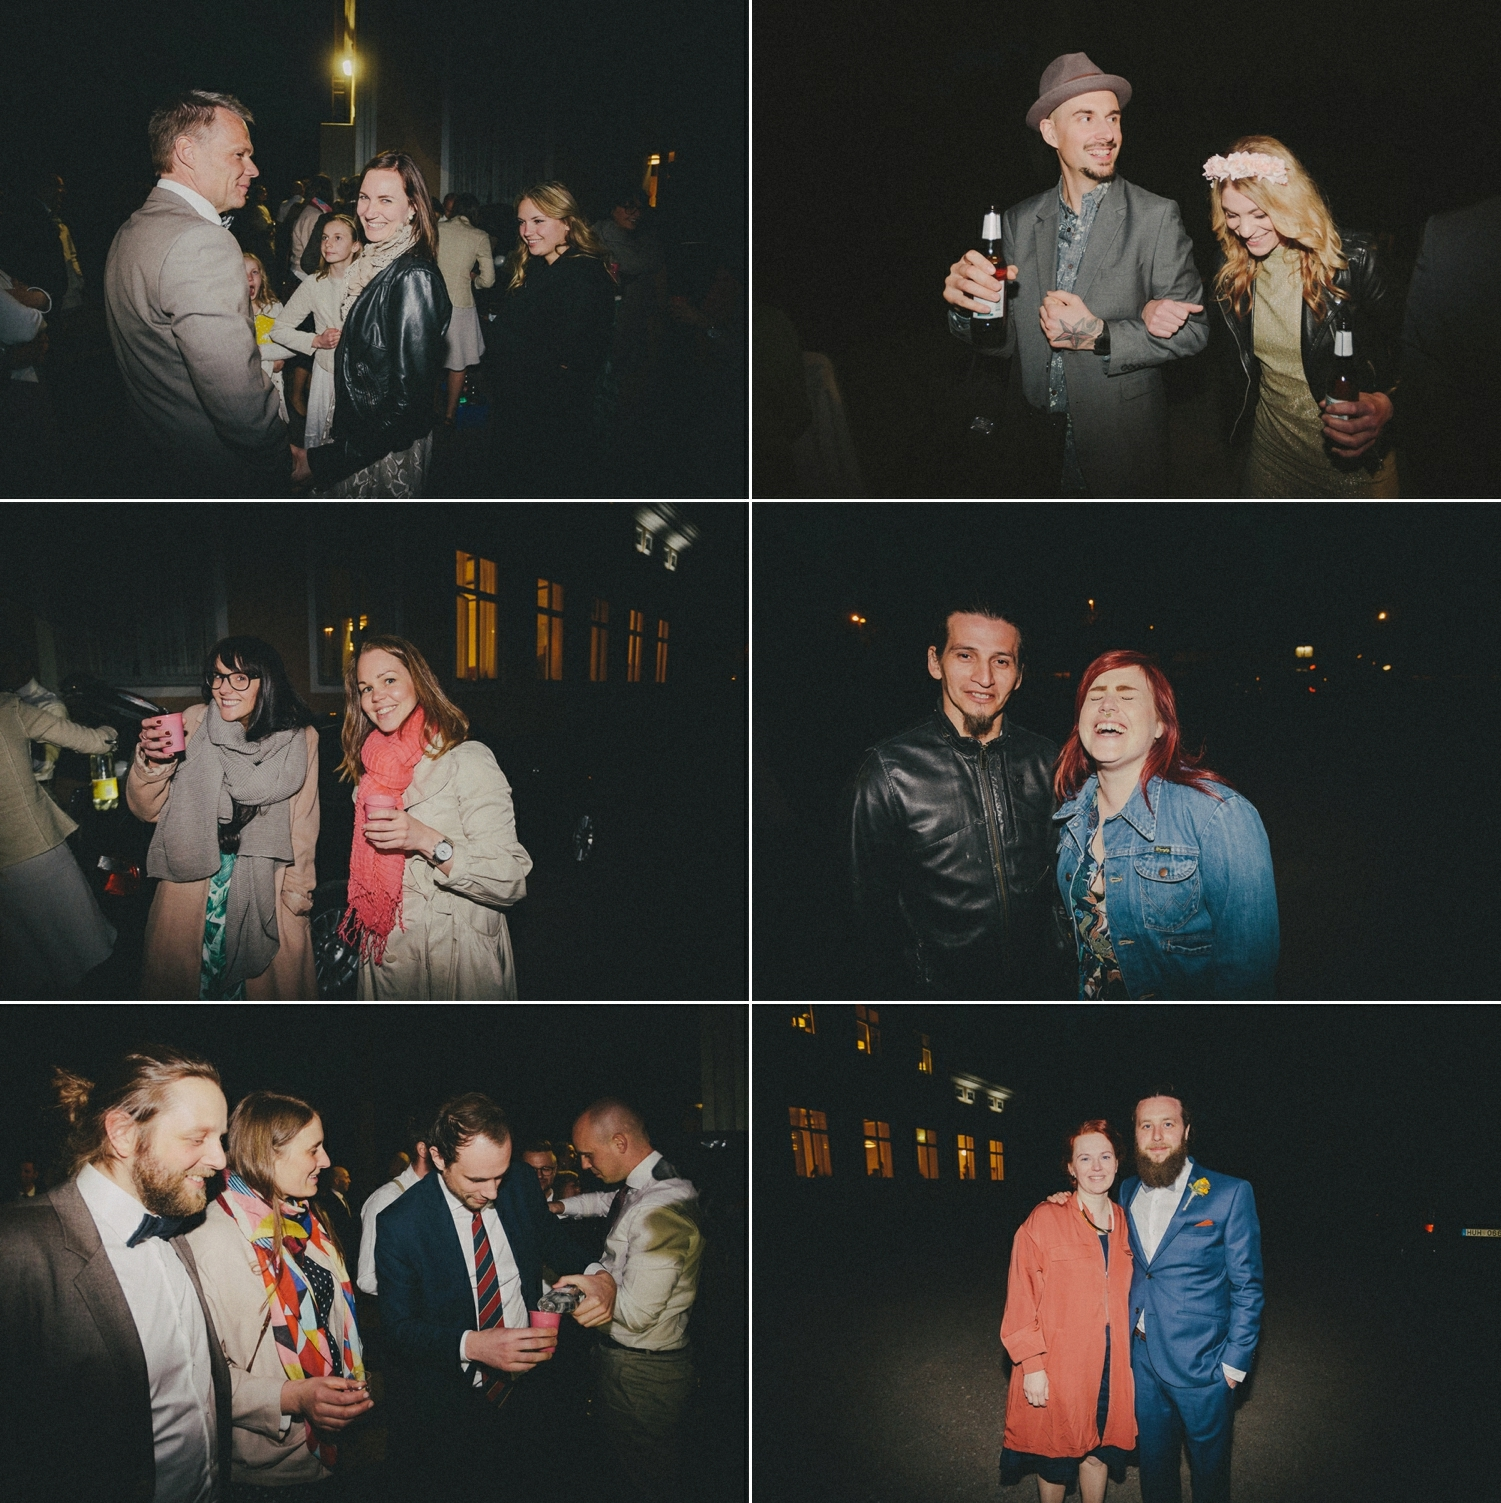 L&A+Wedding+in+Sweden+-+Liron+Erel+Photographer+0145.jpg